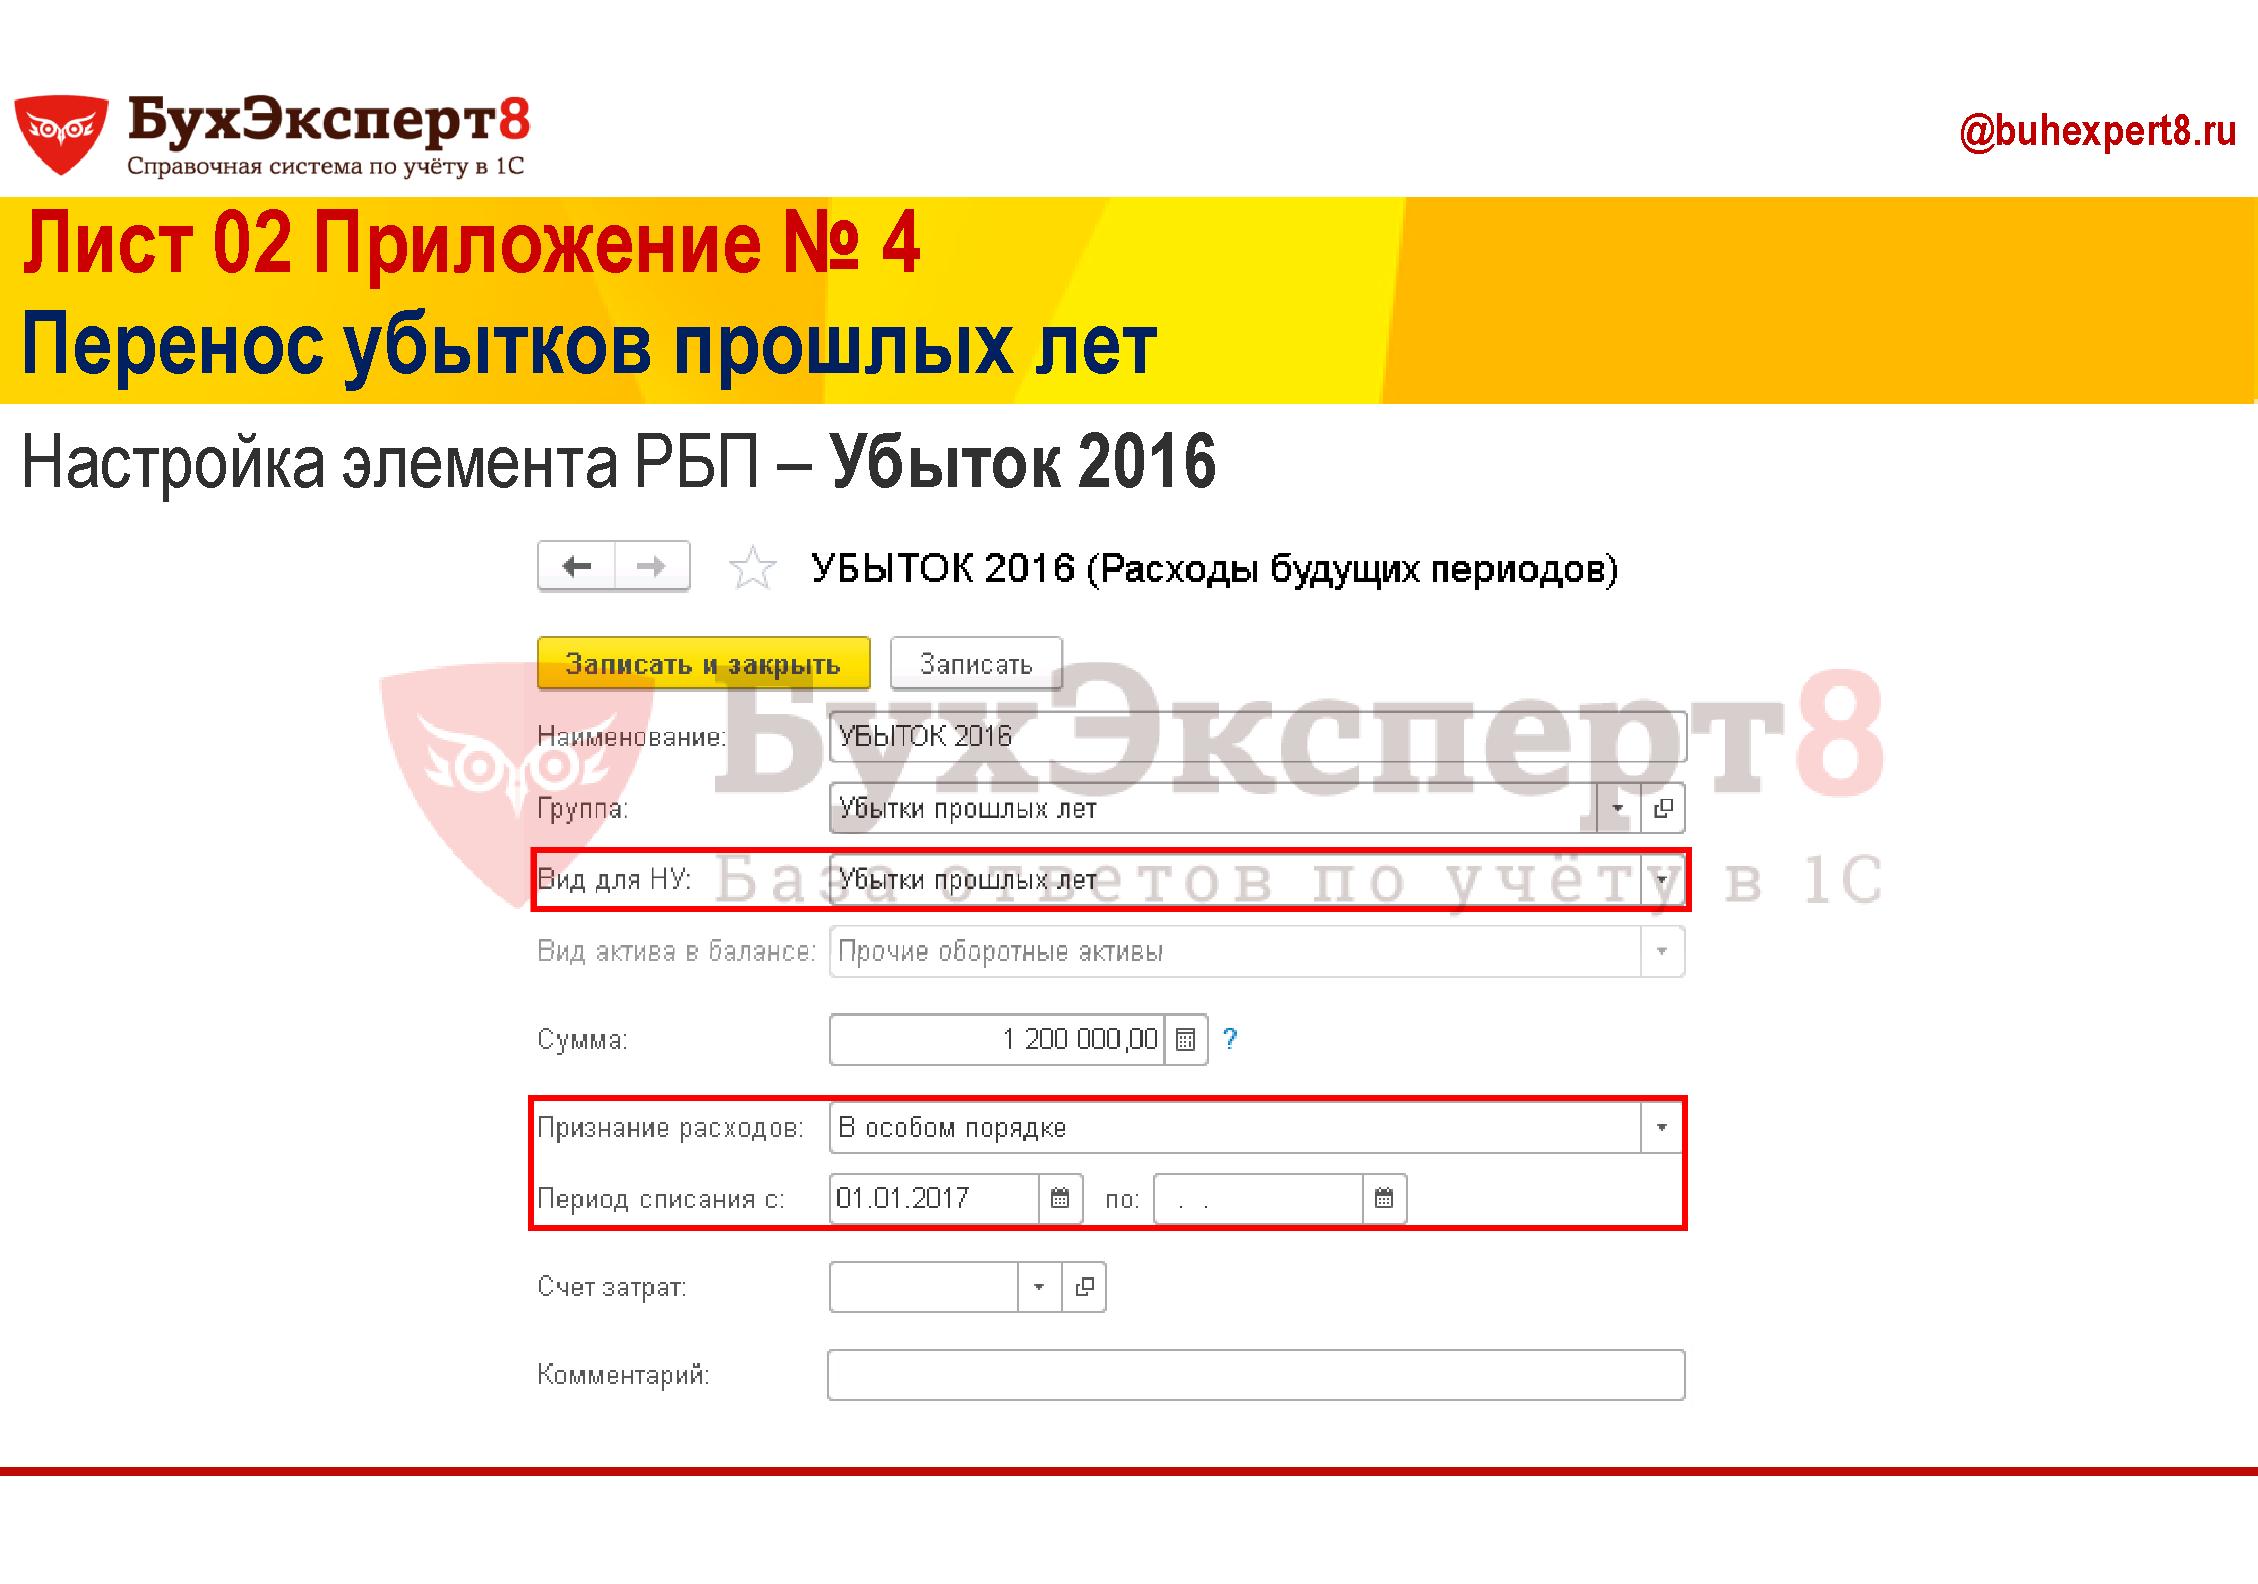 Настройка элемента РБП – Убыток 2016